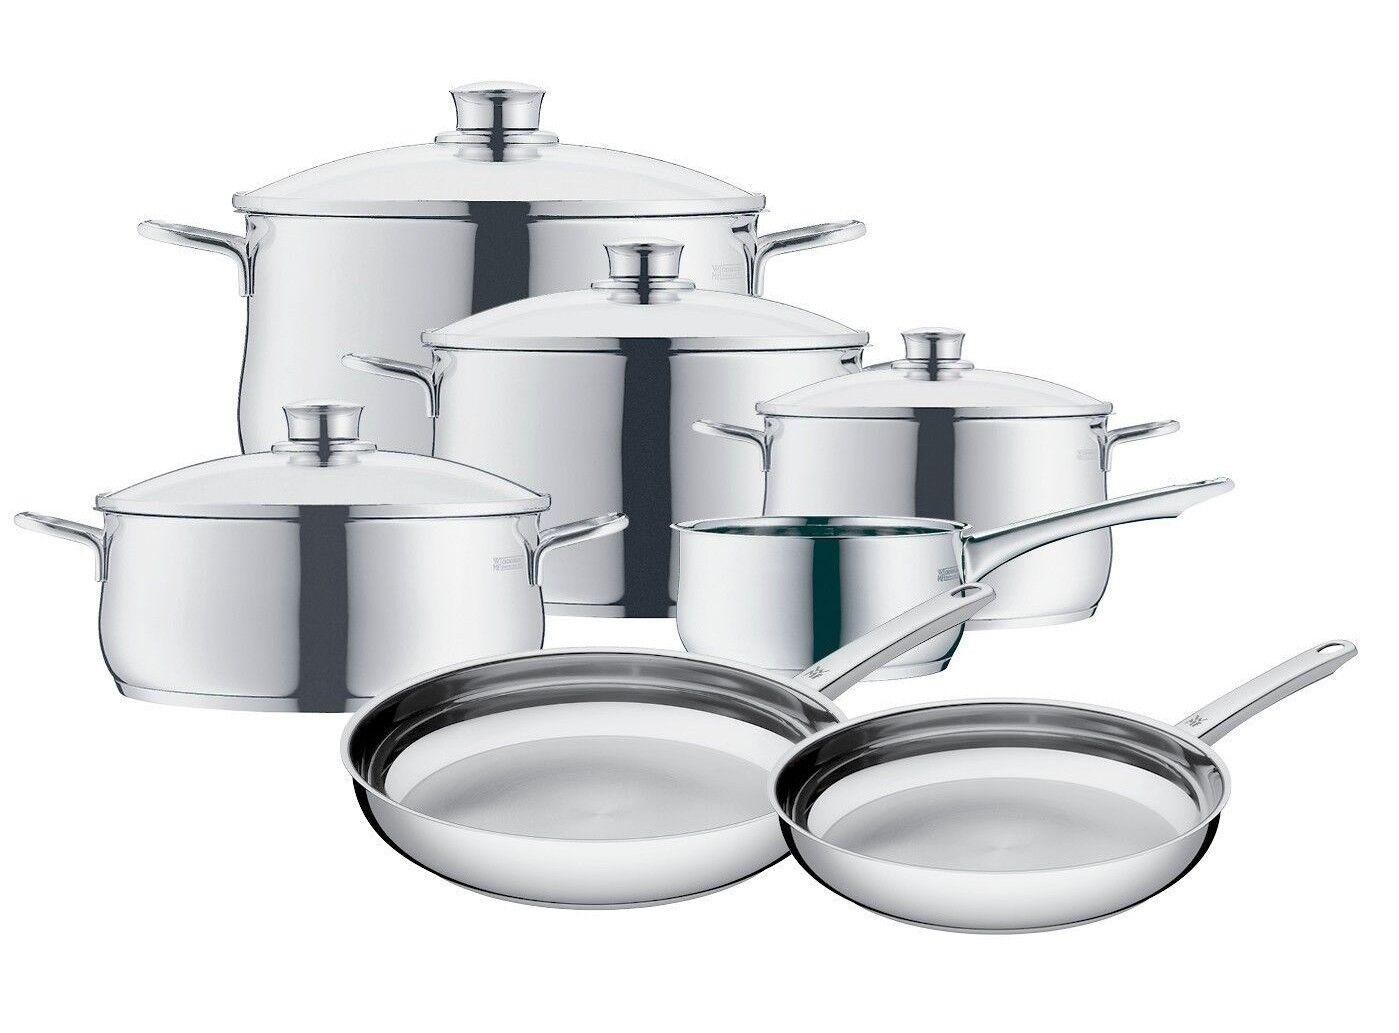 wmf diadem plus 11 piece cookware set 18 10 stainless steel. Black Bedroom Furniture Sets. Home Design Ideas